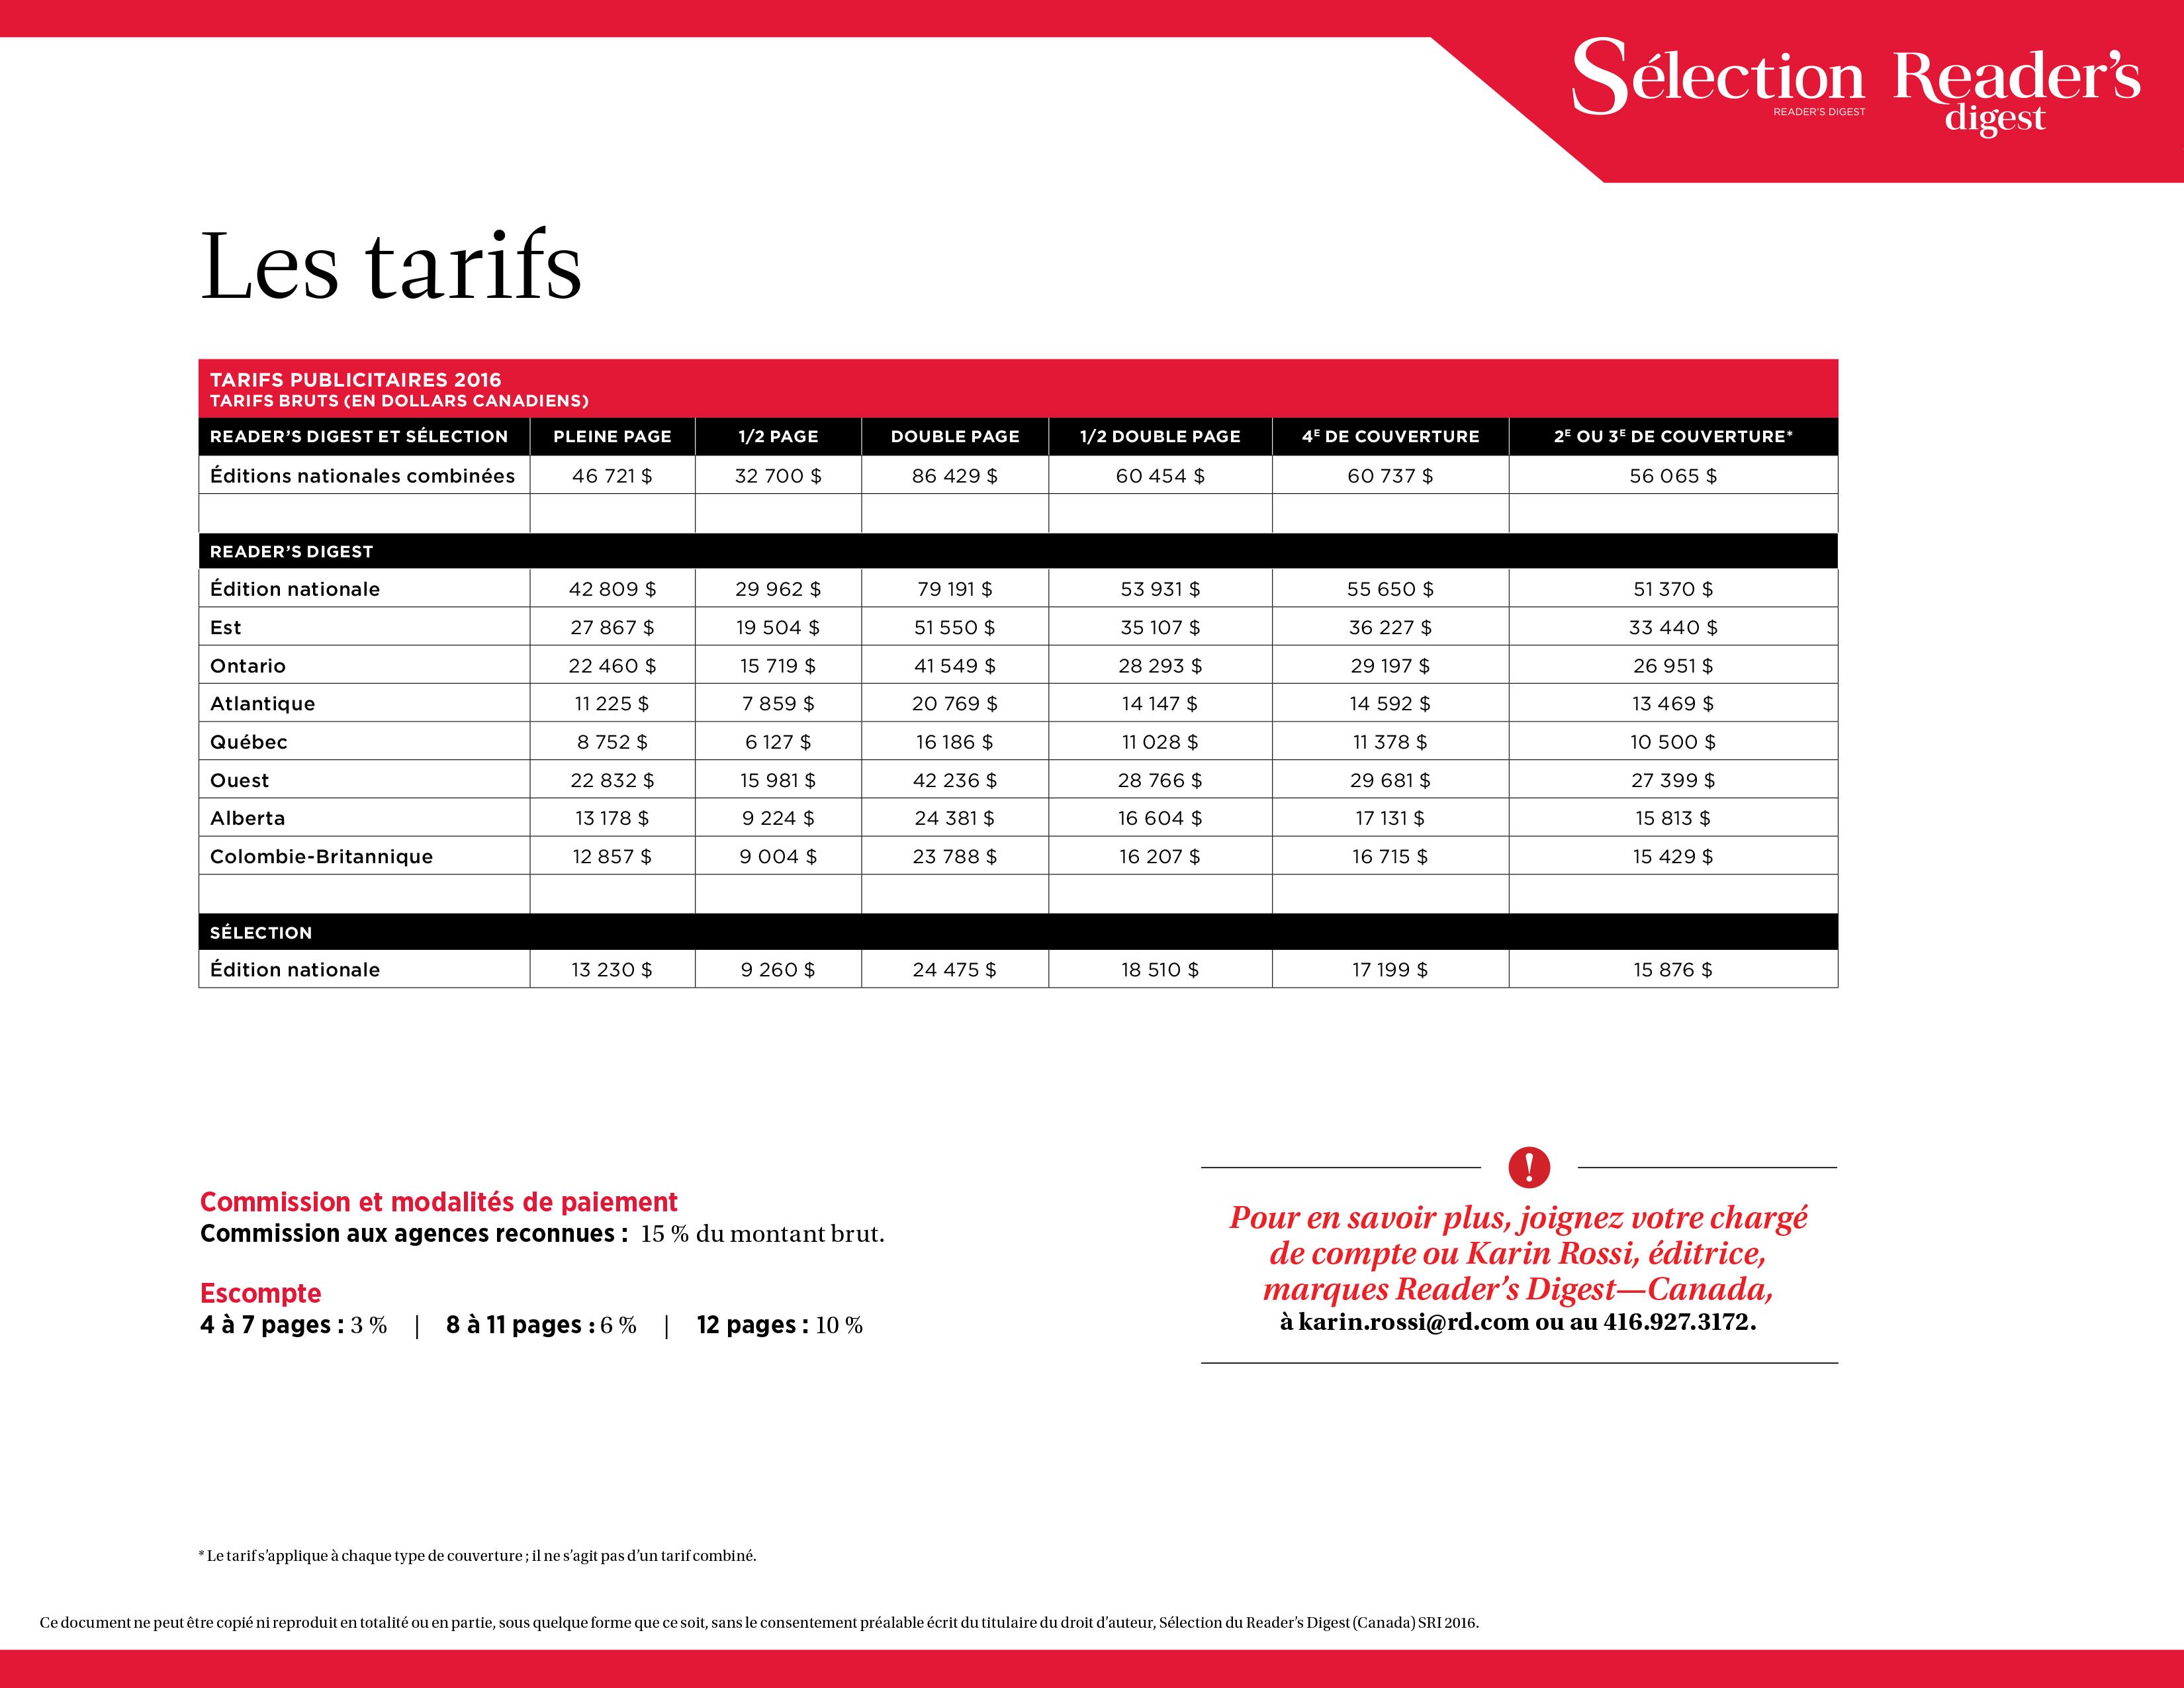 SRD Rates